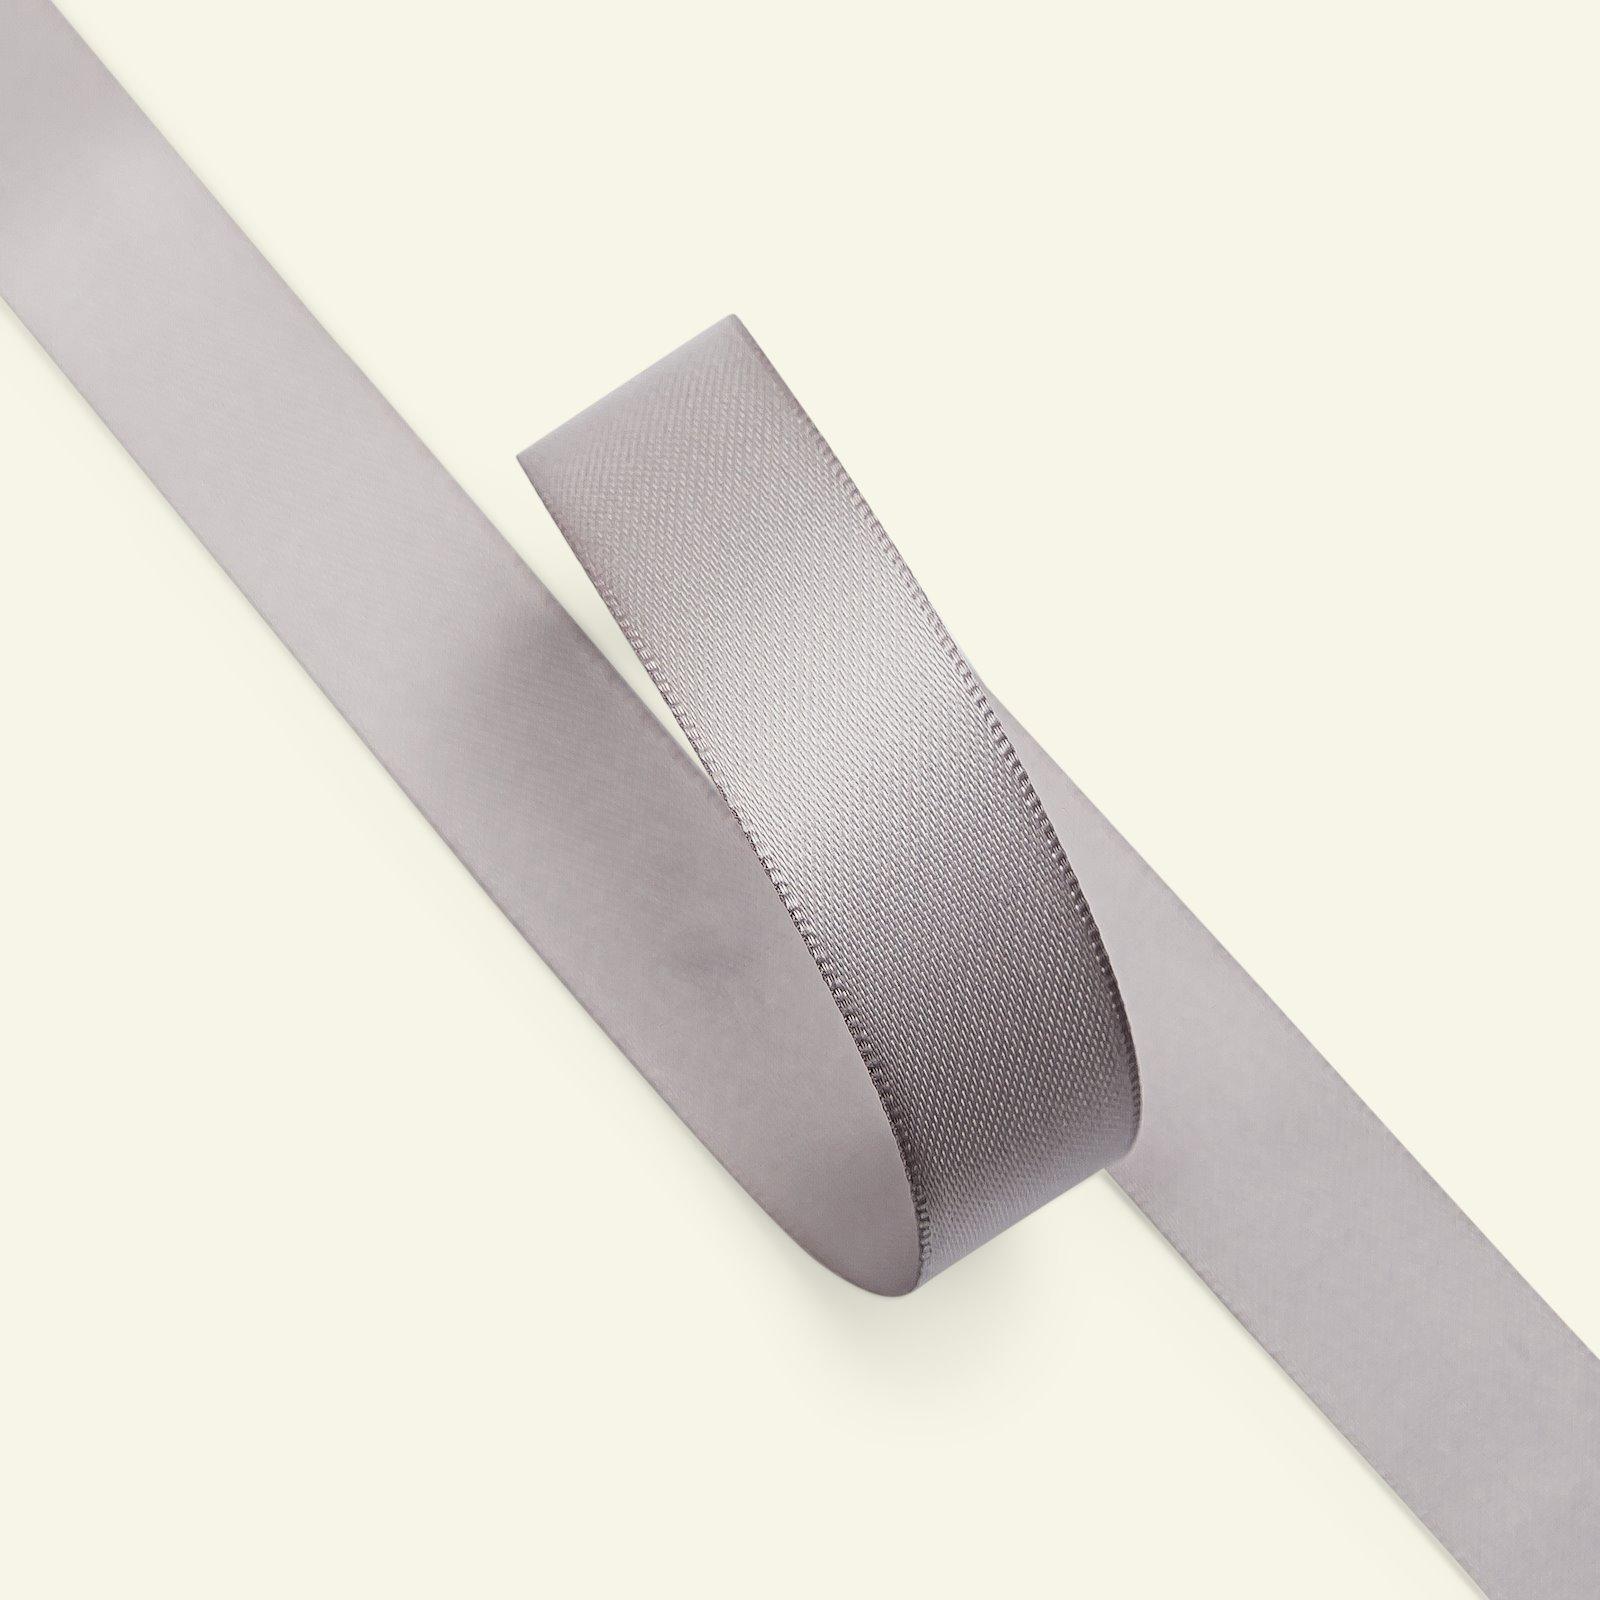 Satin ribbon 15mm grey 5m 27241_pack